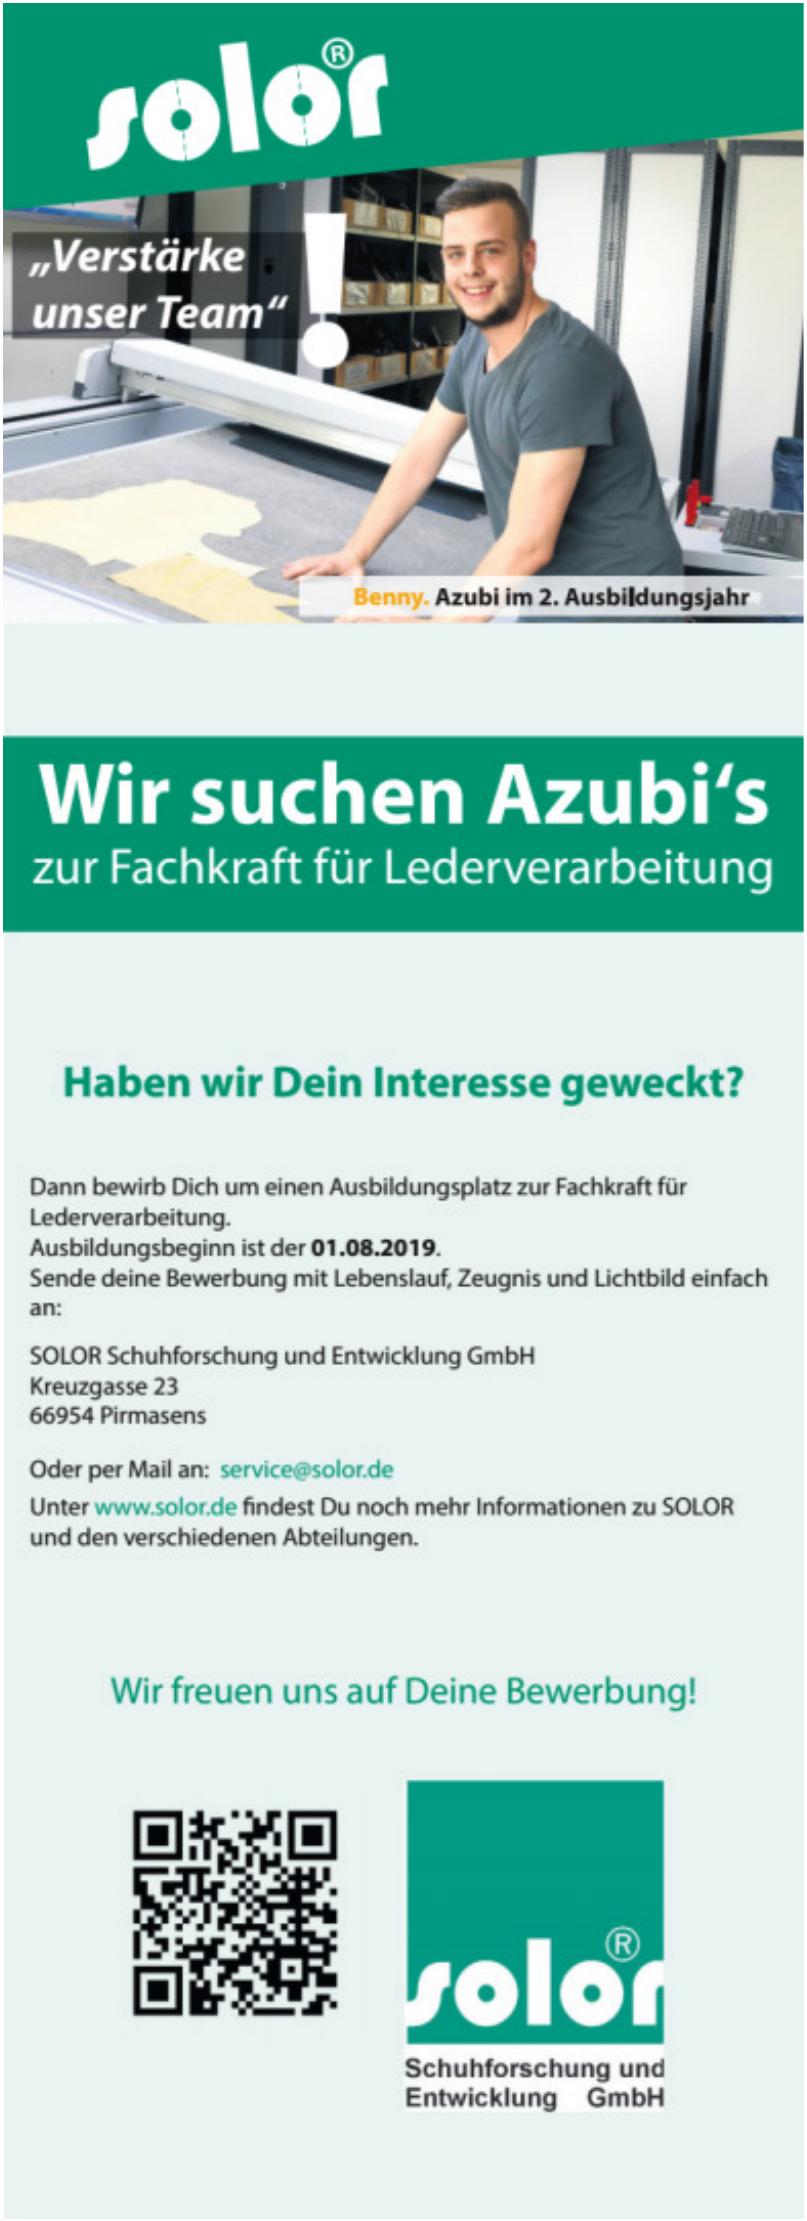 Solor Schuhforschung und Entwicklung GmbH